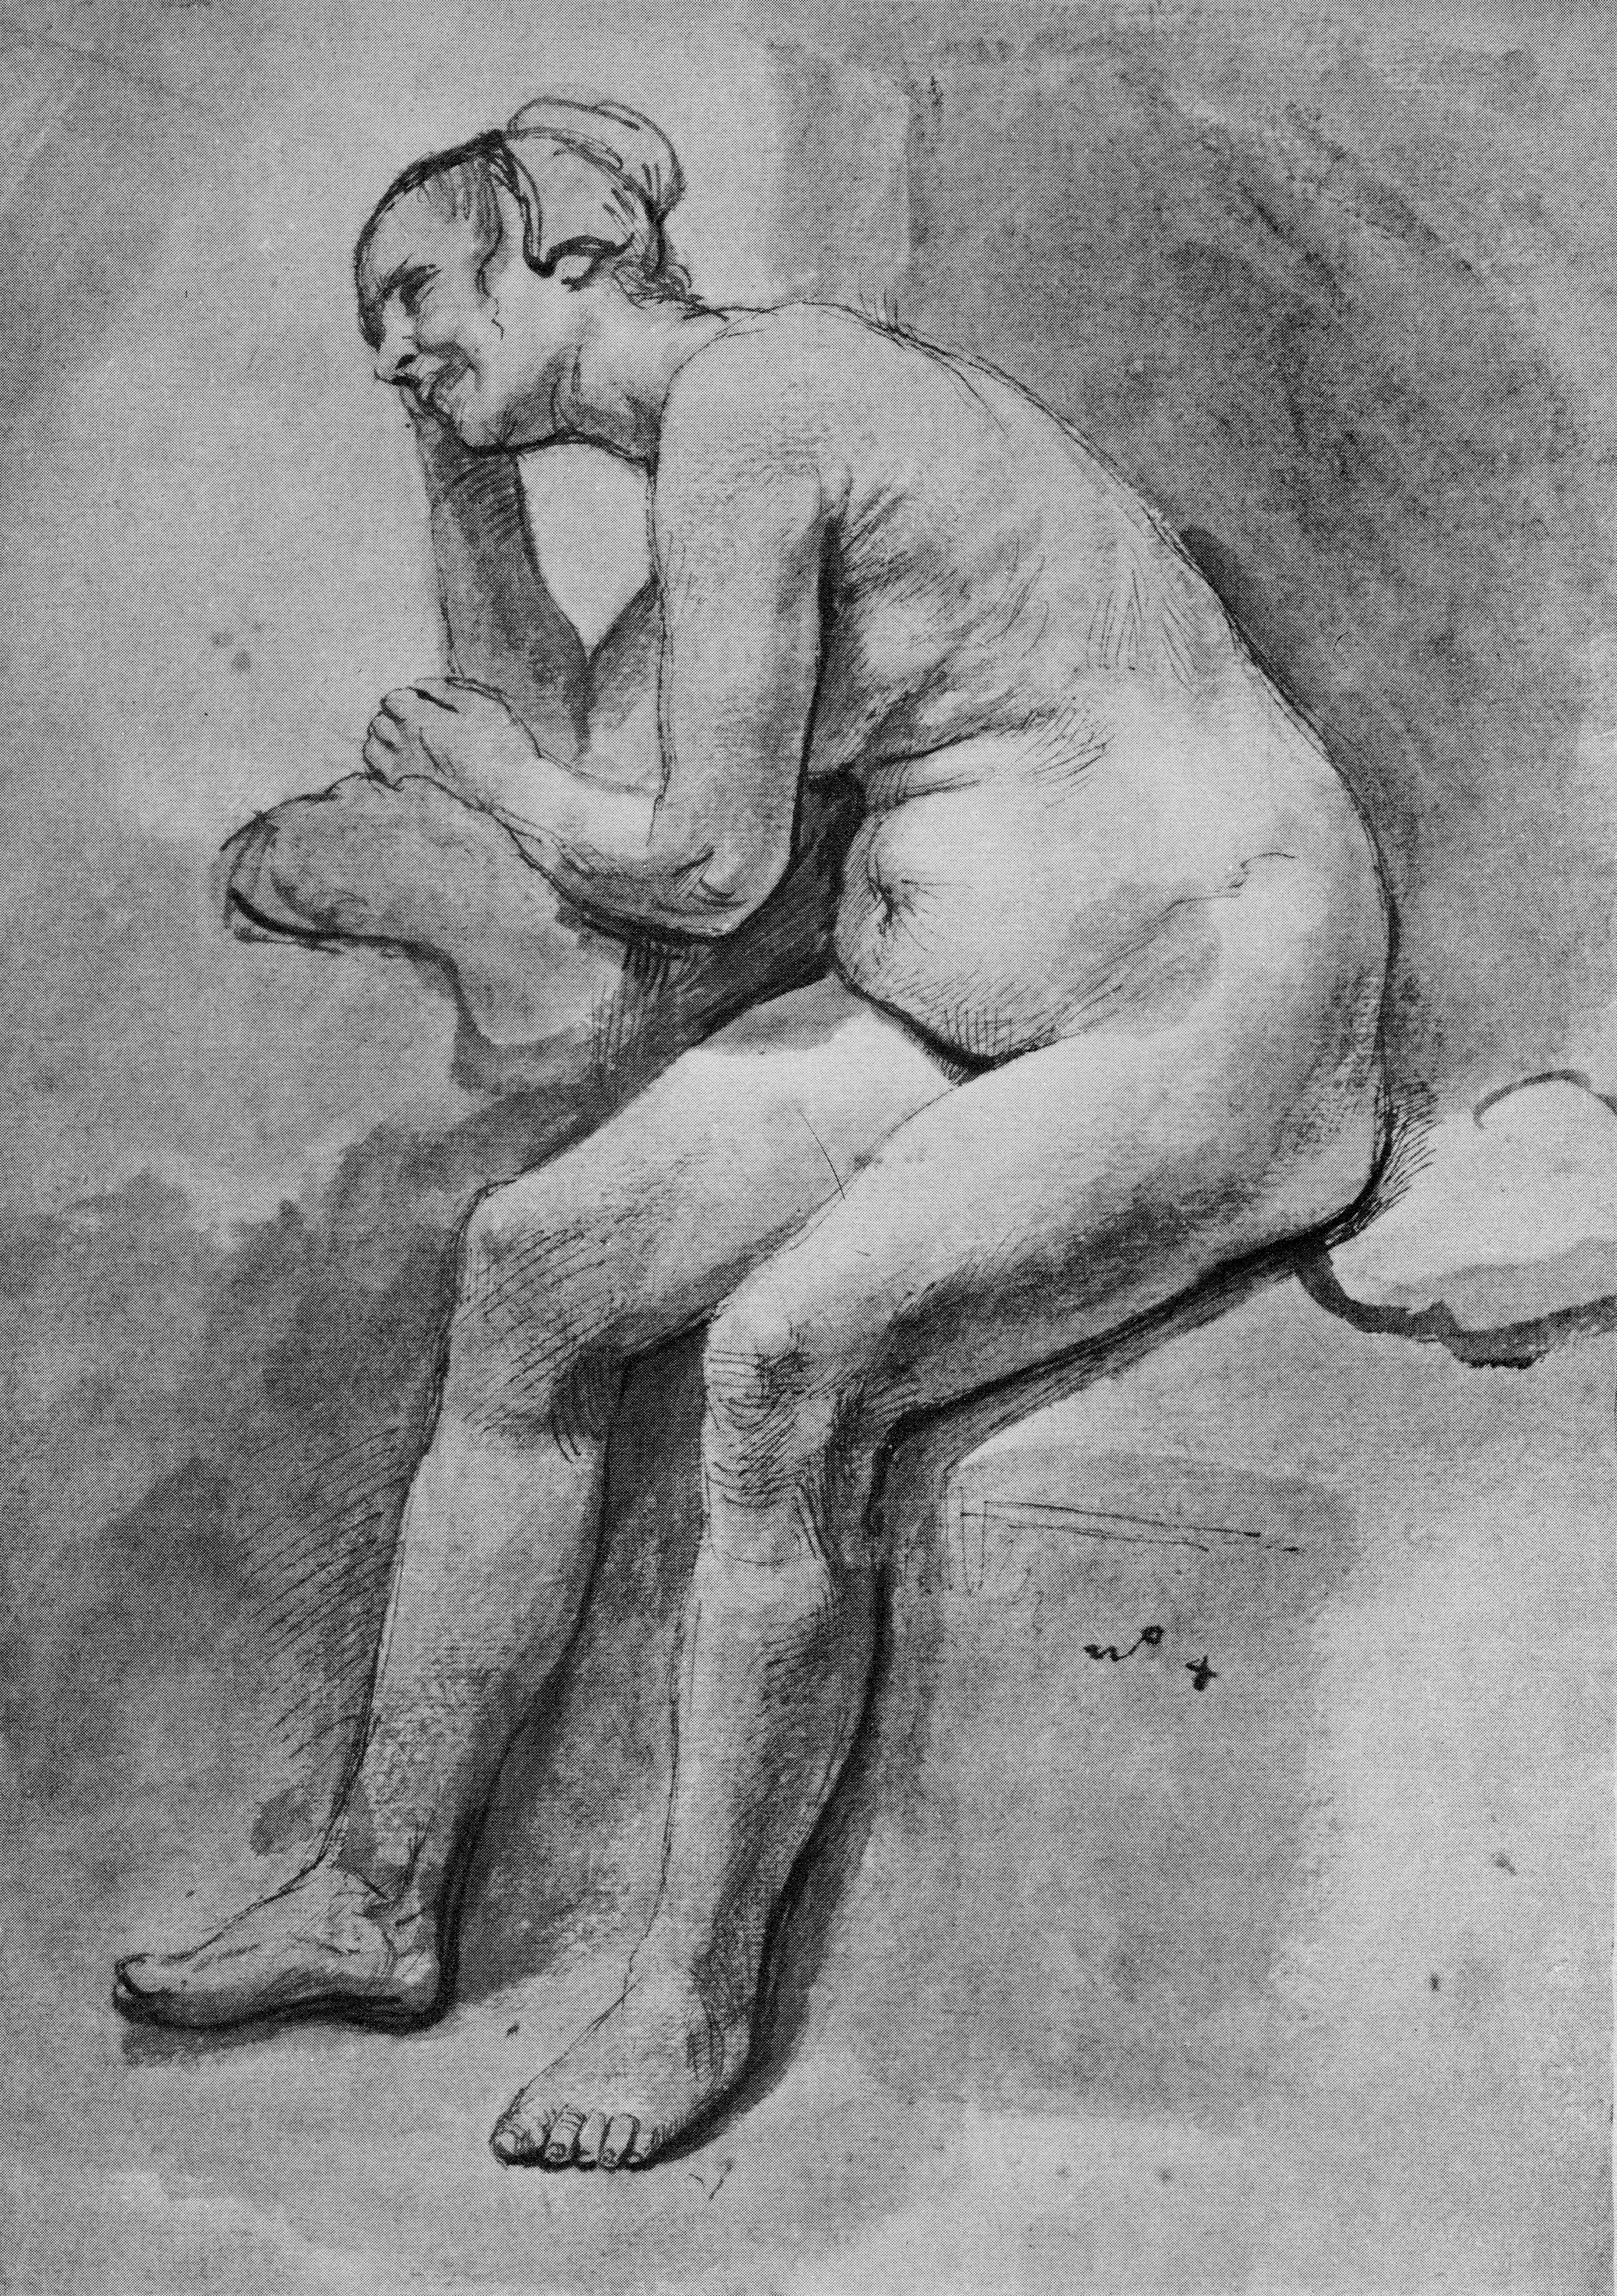 Azotado por su padre desnudo